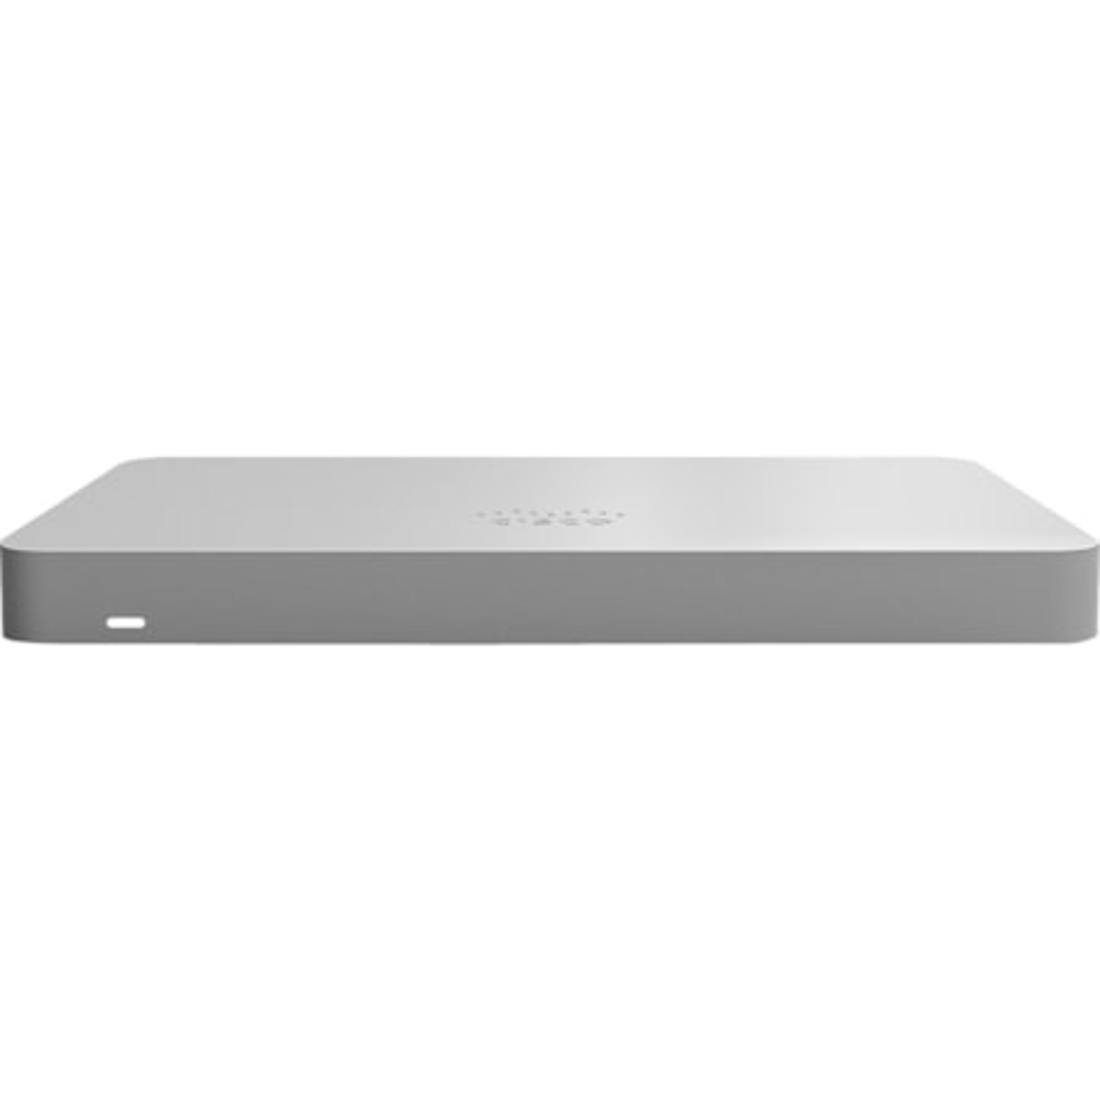 Meraki MX67 Network Security/Firewall Appliance